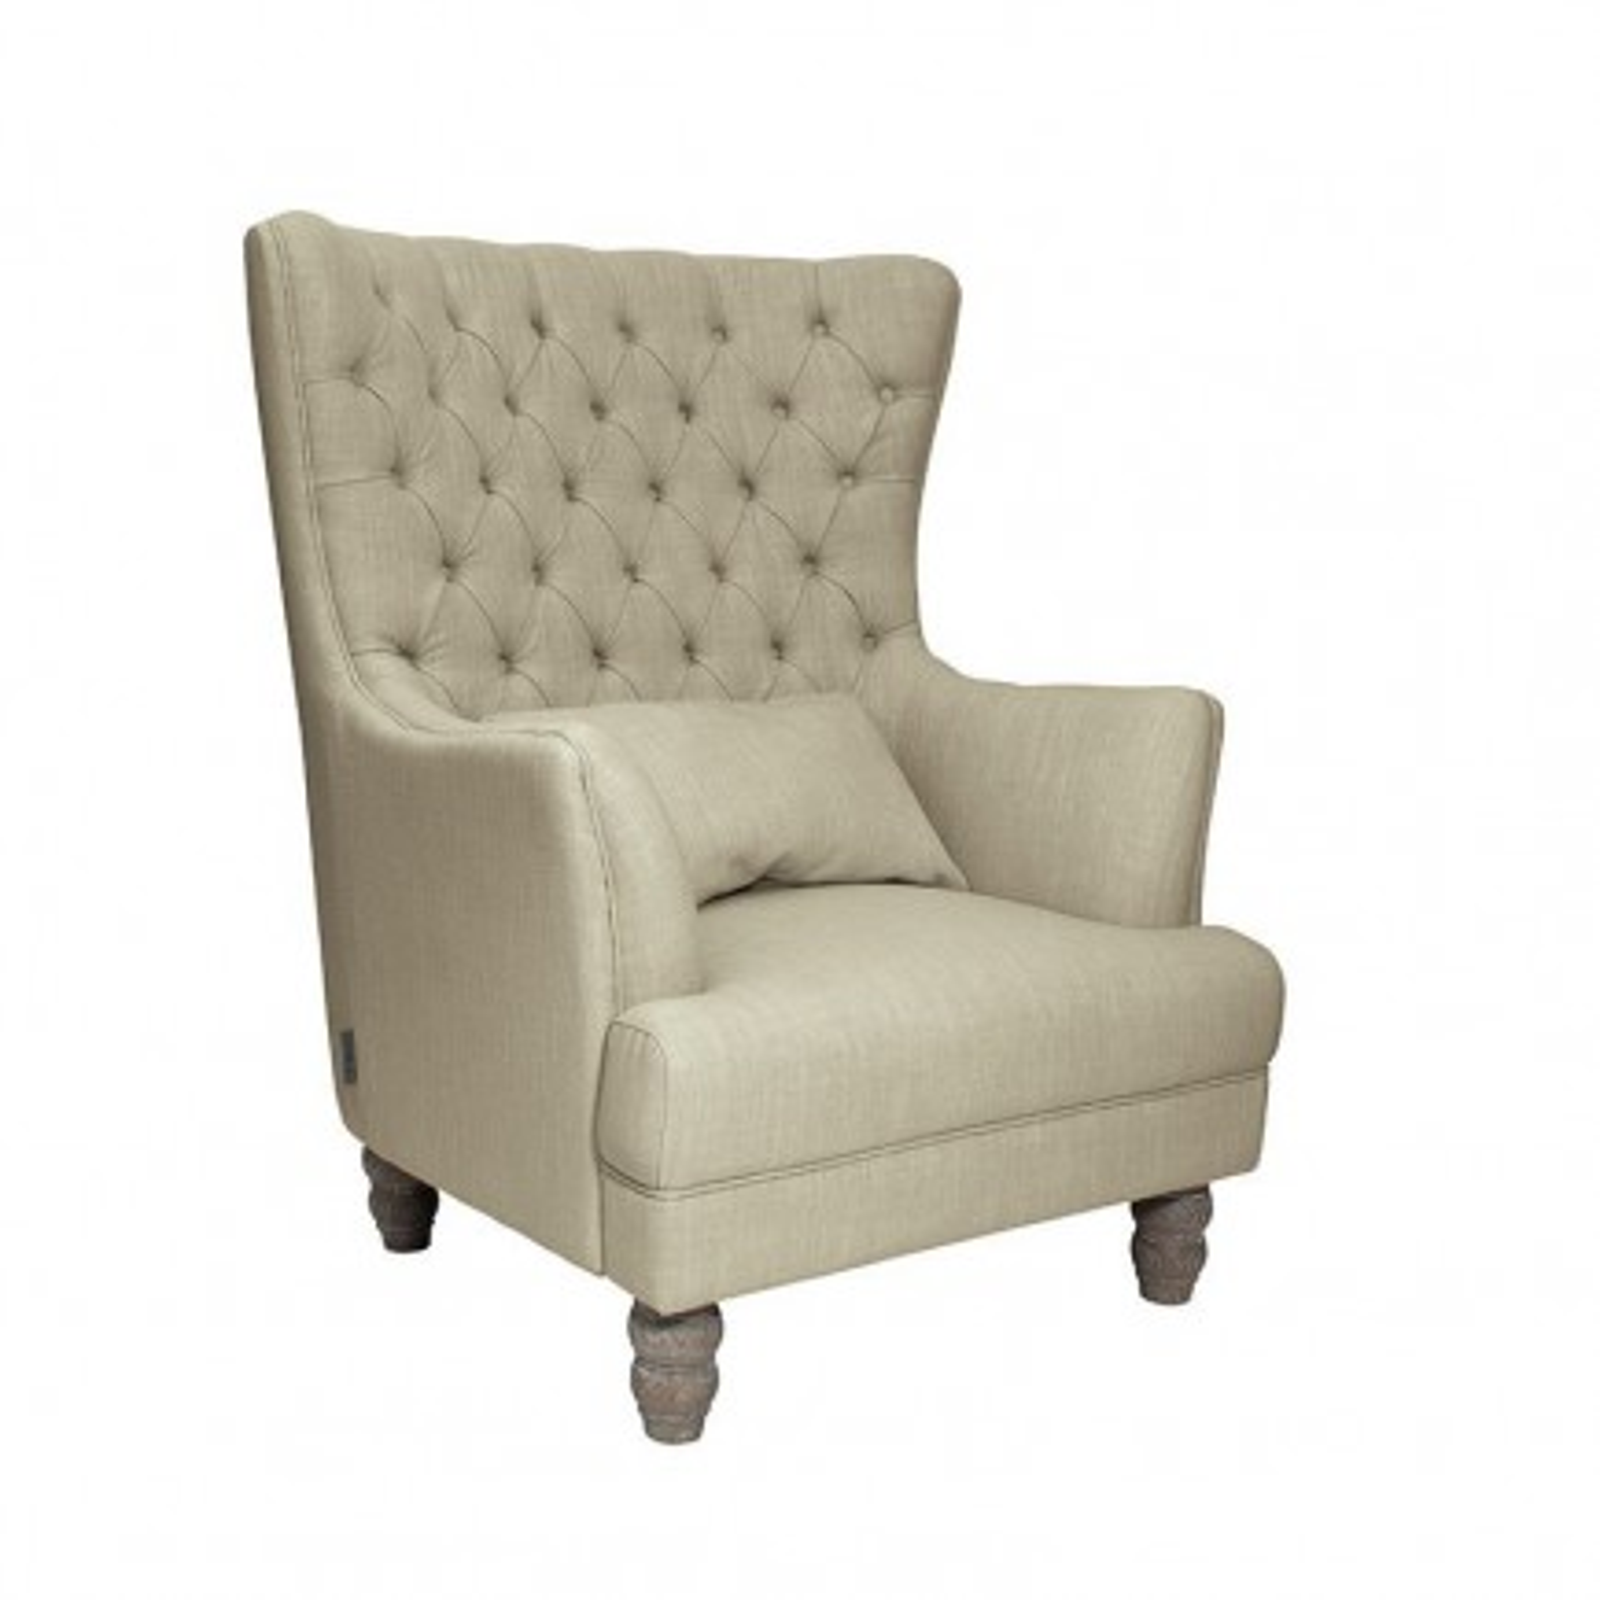 Fauteuil Hailey Tissu - meuble classique